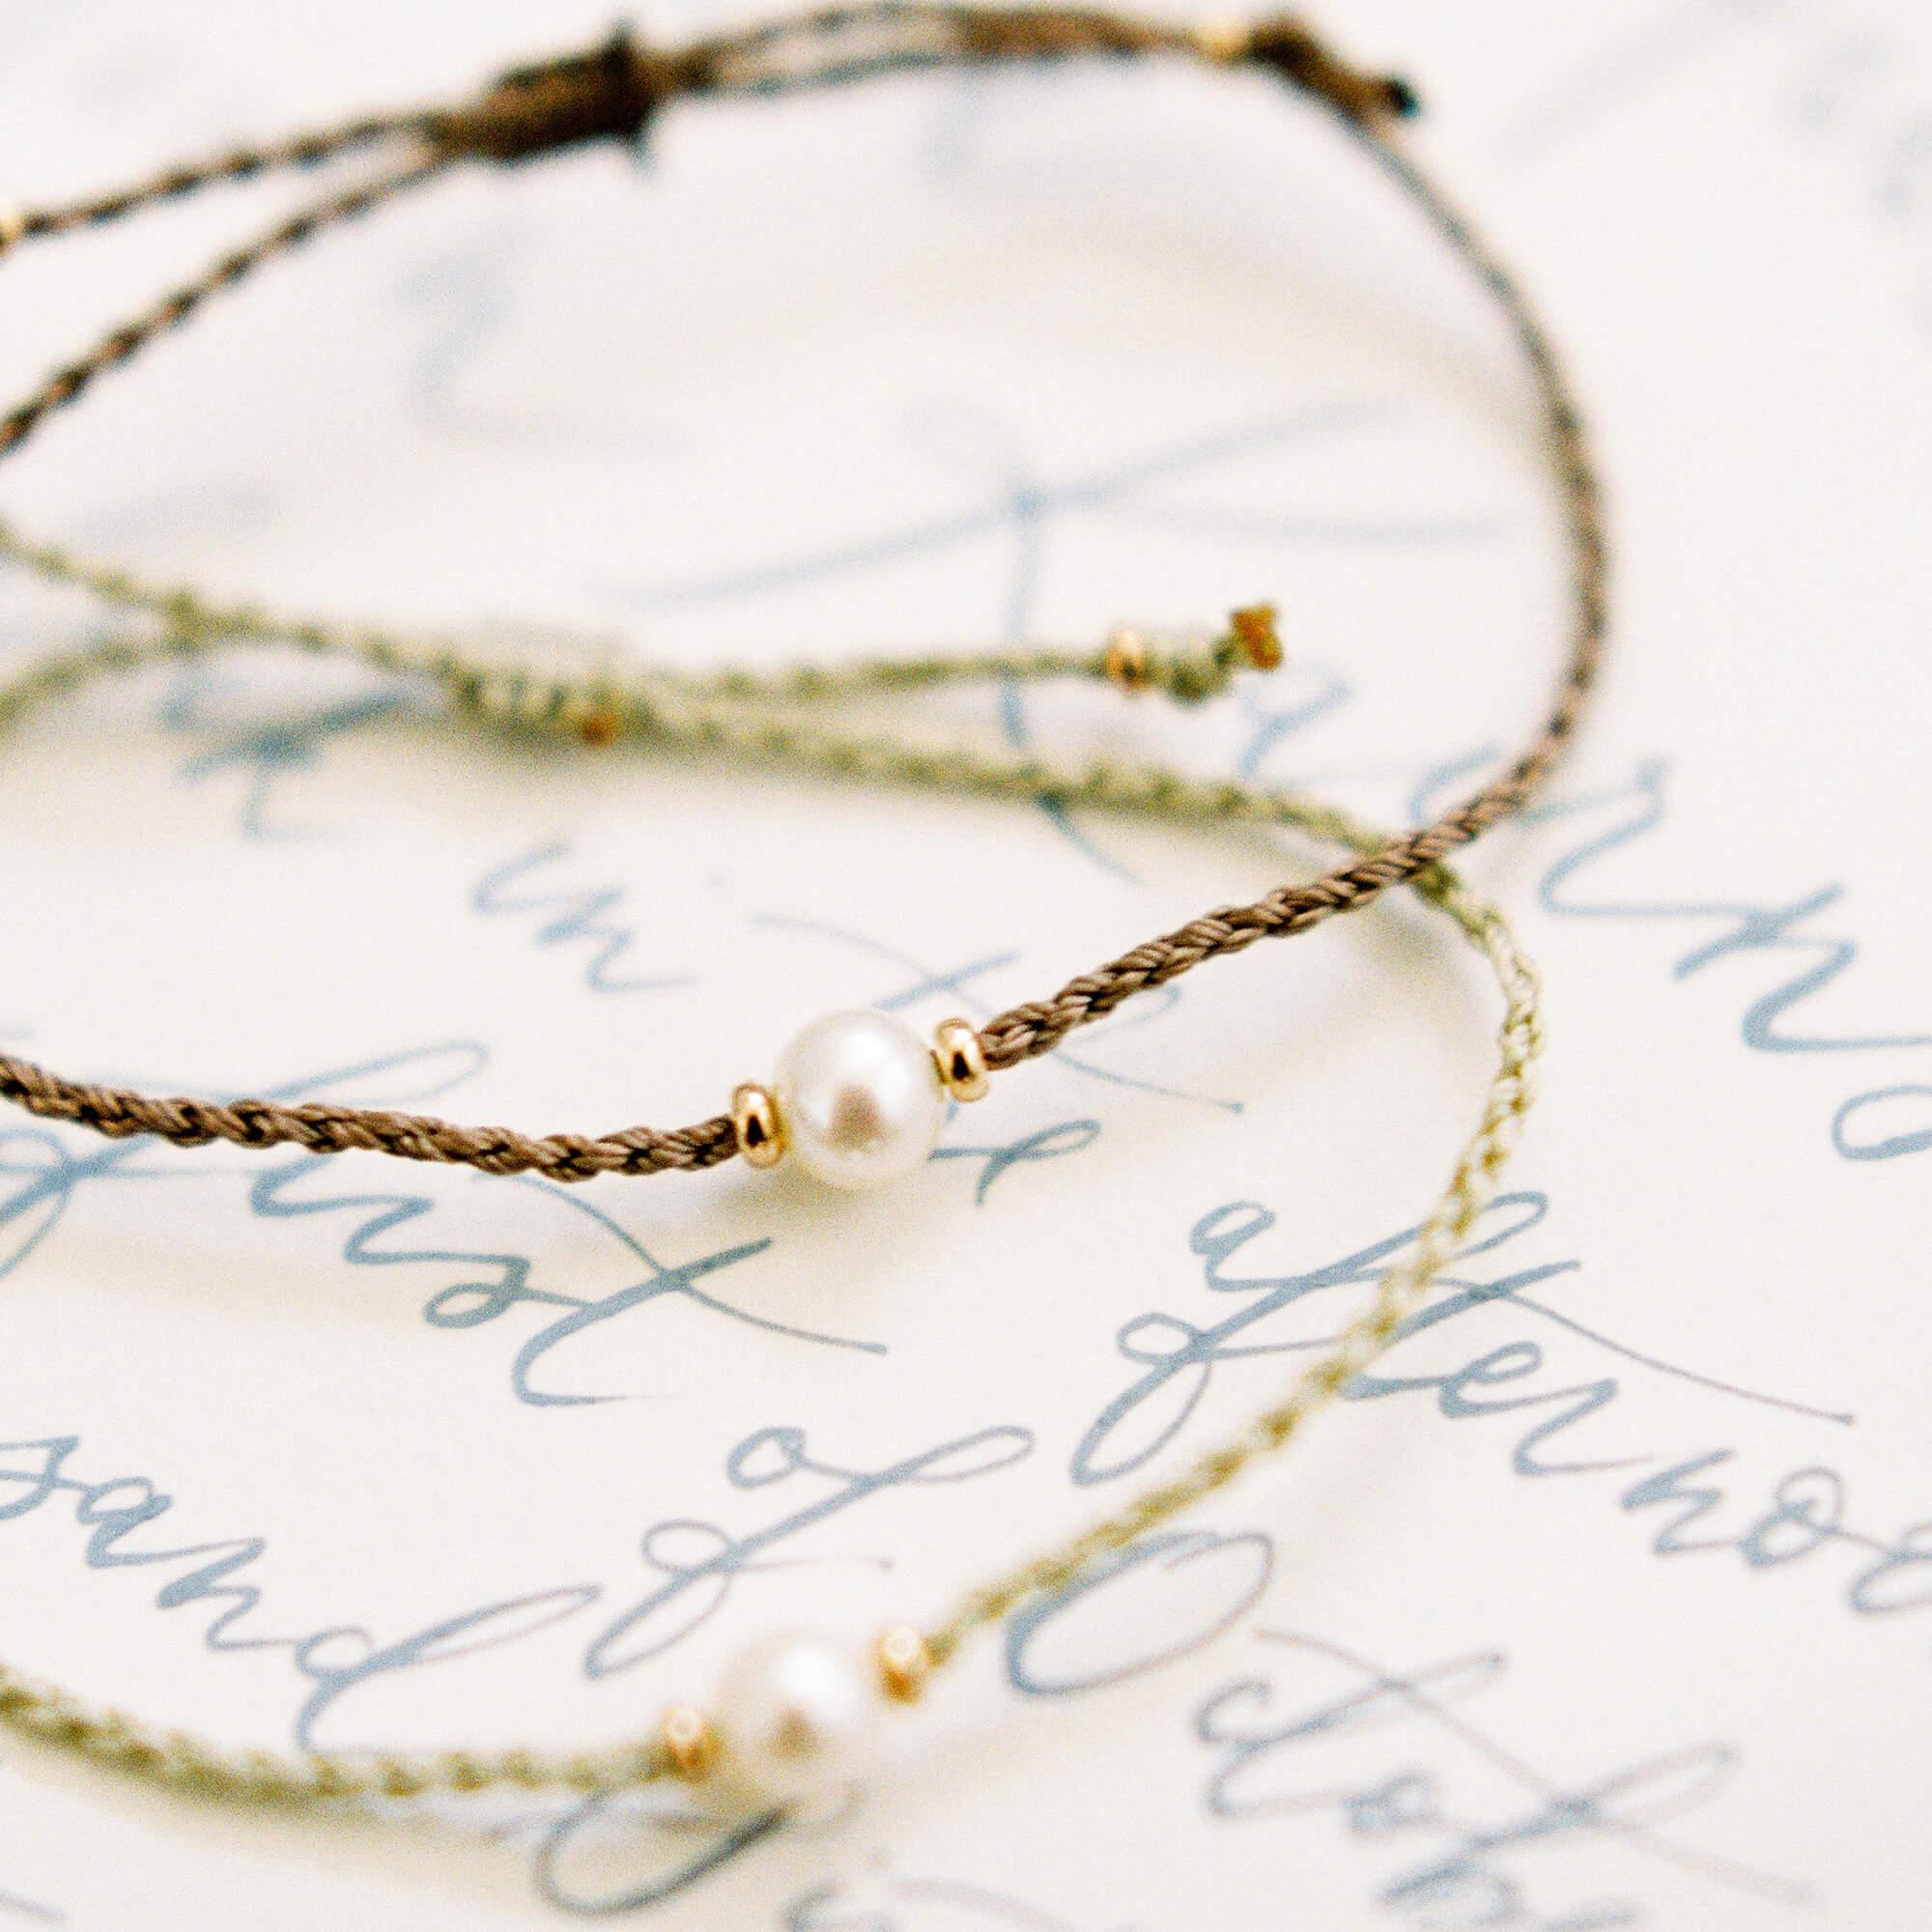 An akoya pearl and gold bead bracelet